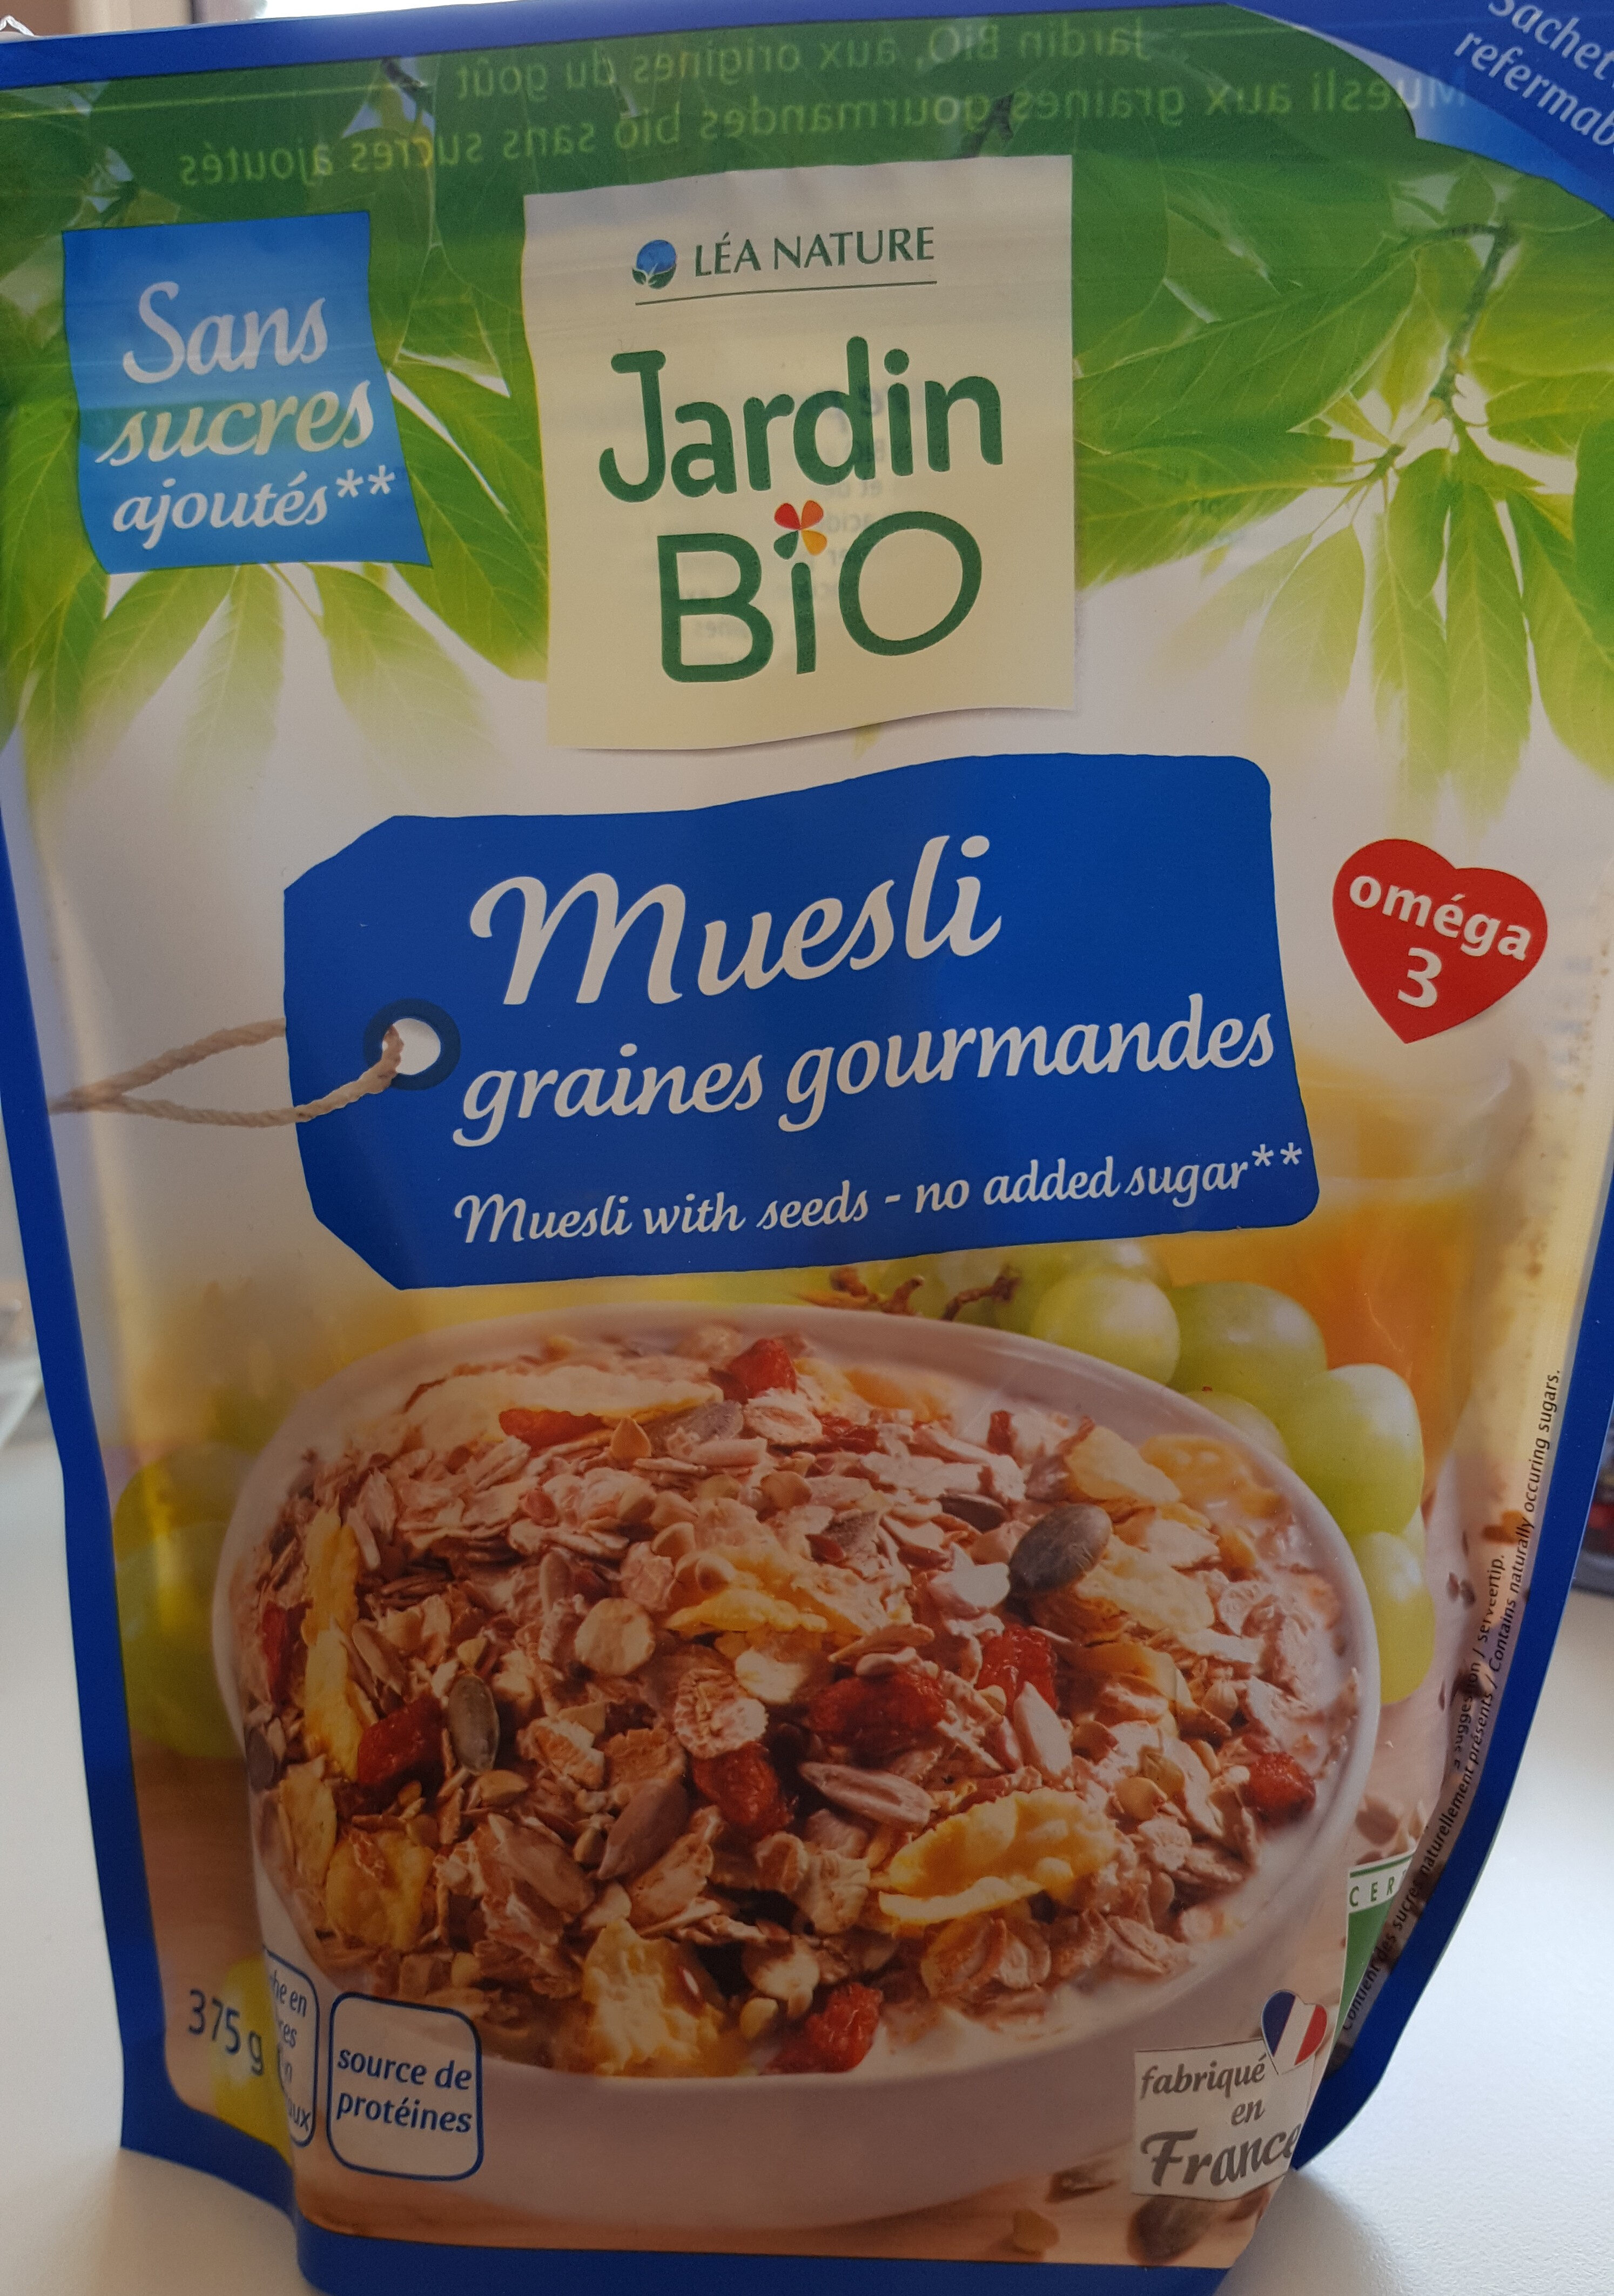 muesli graines gourmandes - Product - fr